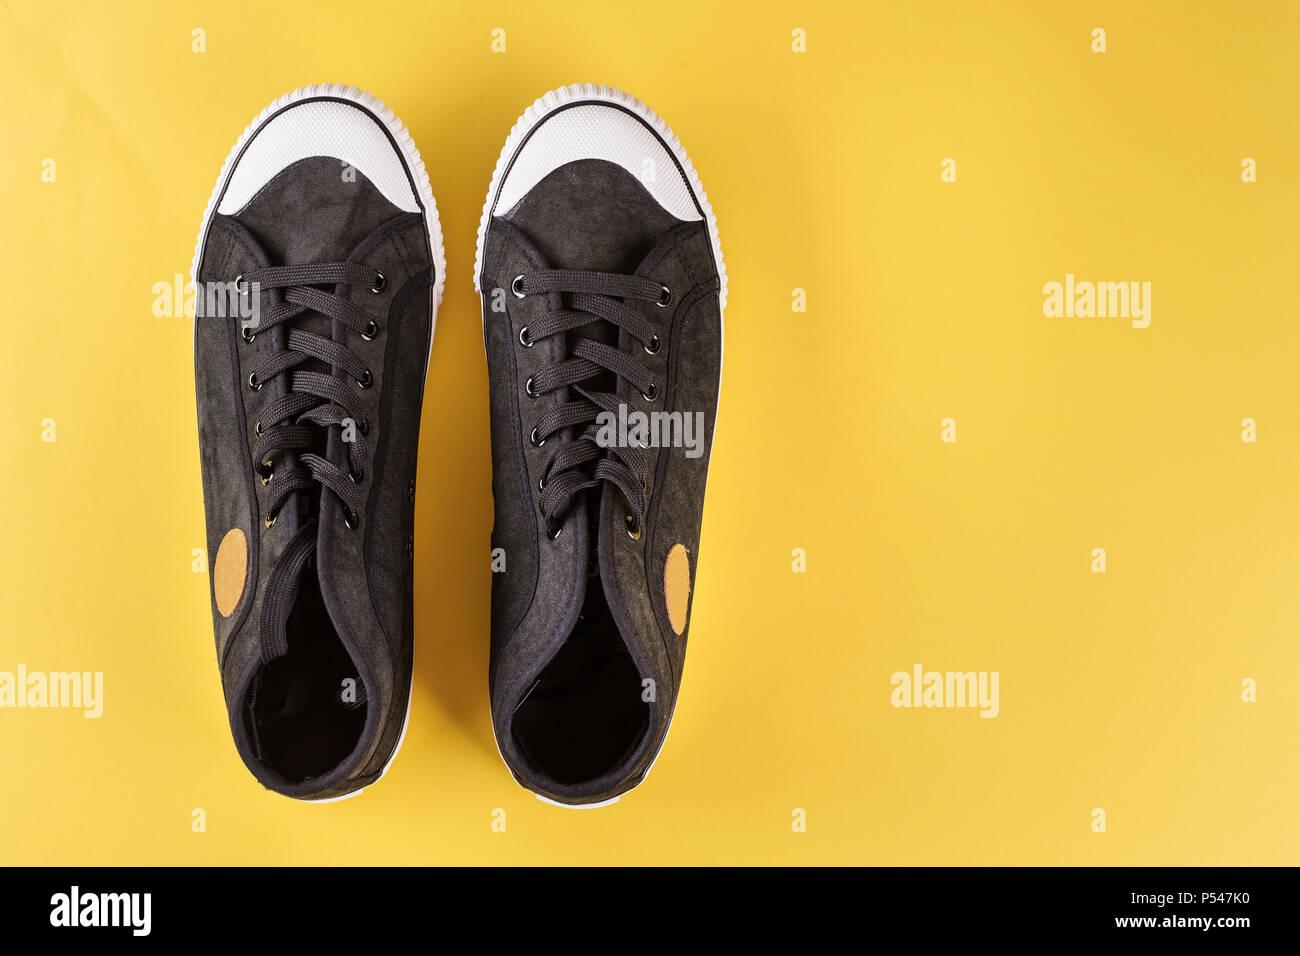 Schwarzer Sneaker Stockfotos & Schwarzer Sneaker Bilder Alamy